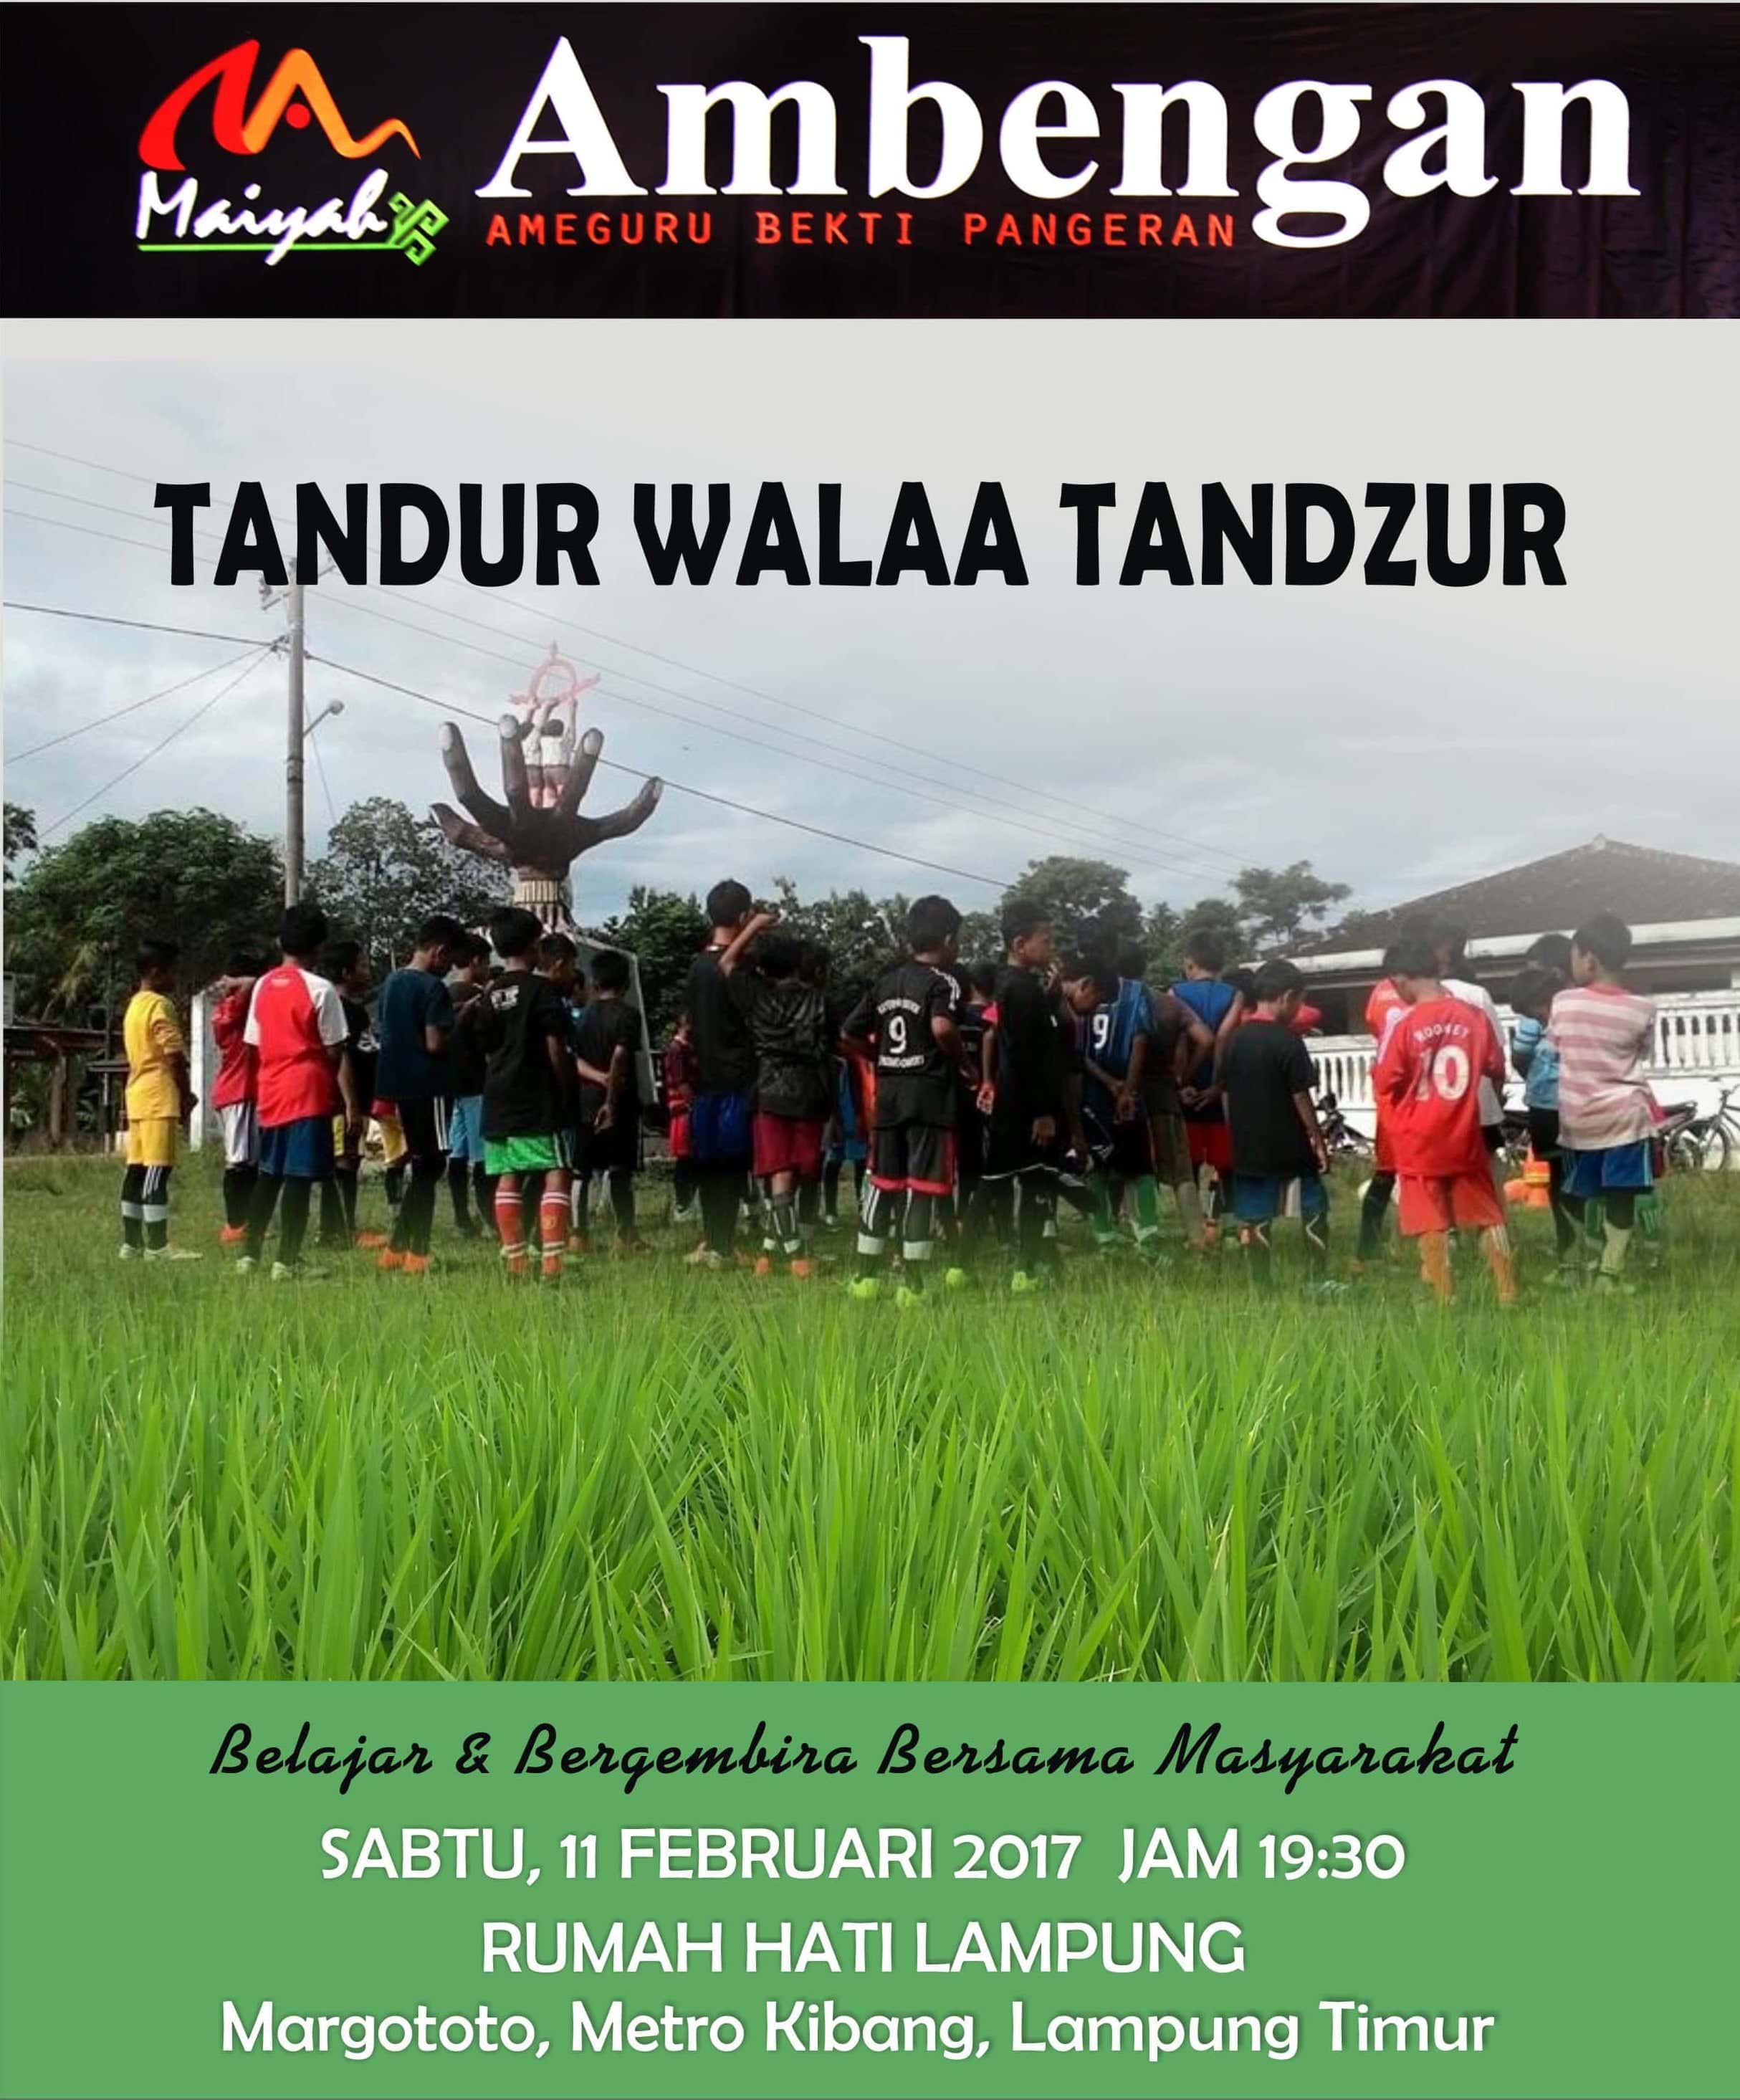 Maiyah Dusun Ambengan, 11 Februari 2017